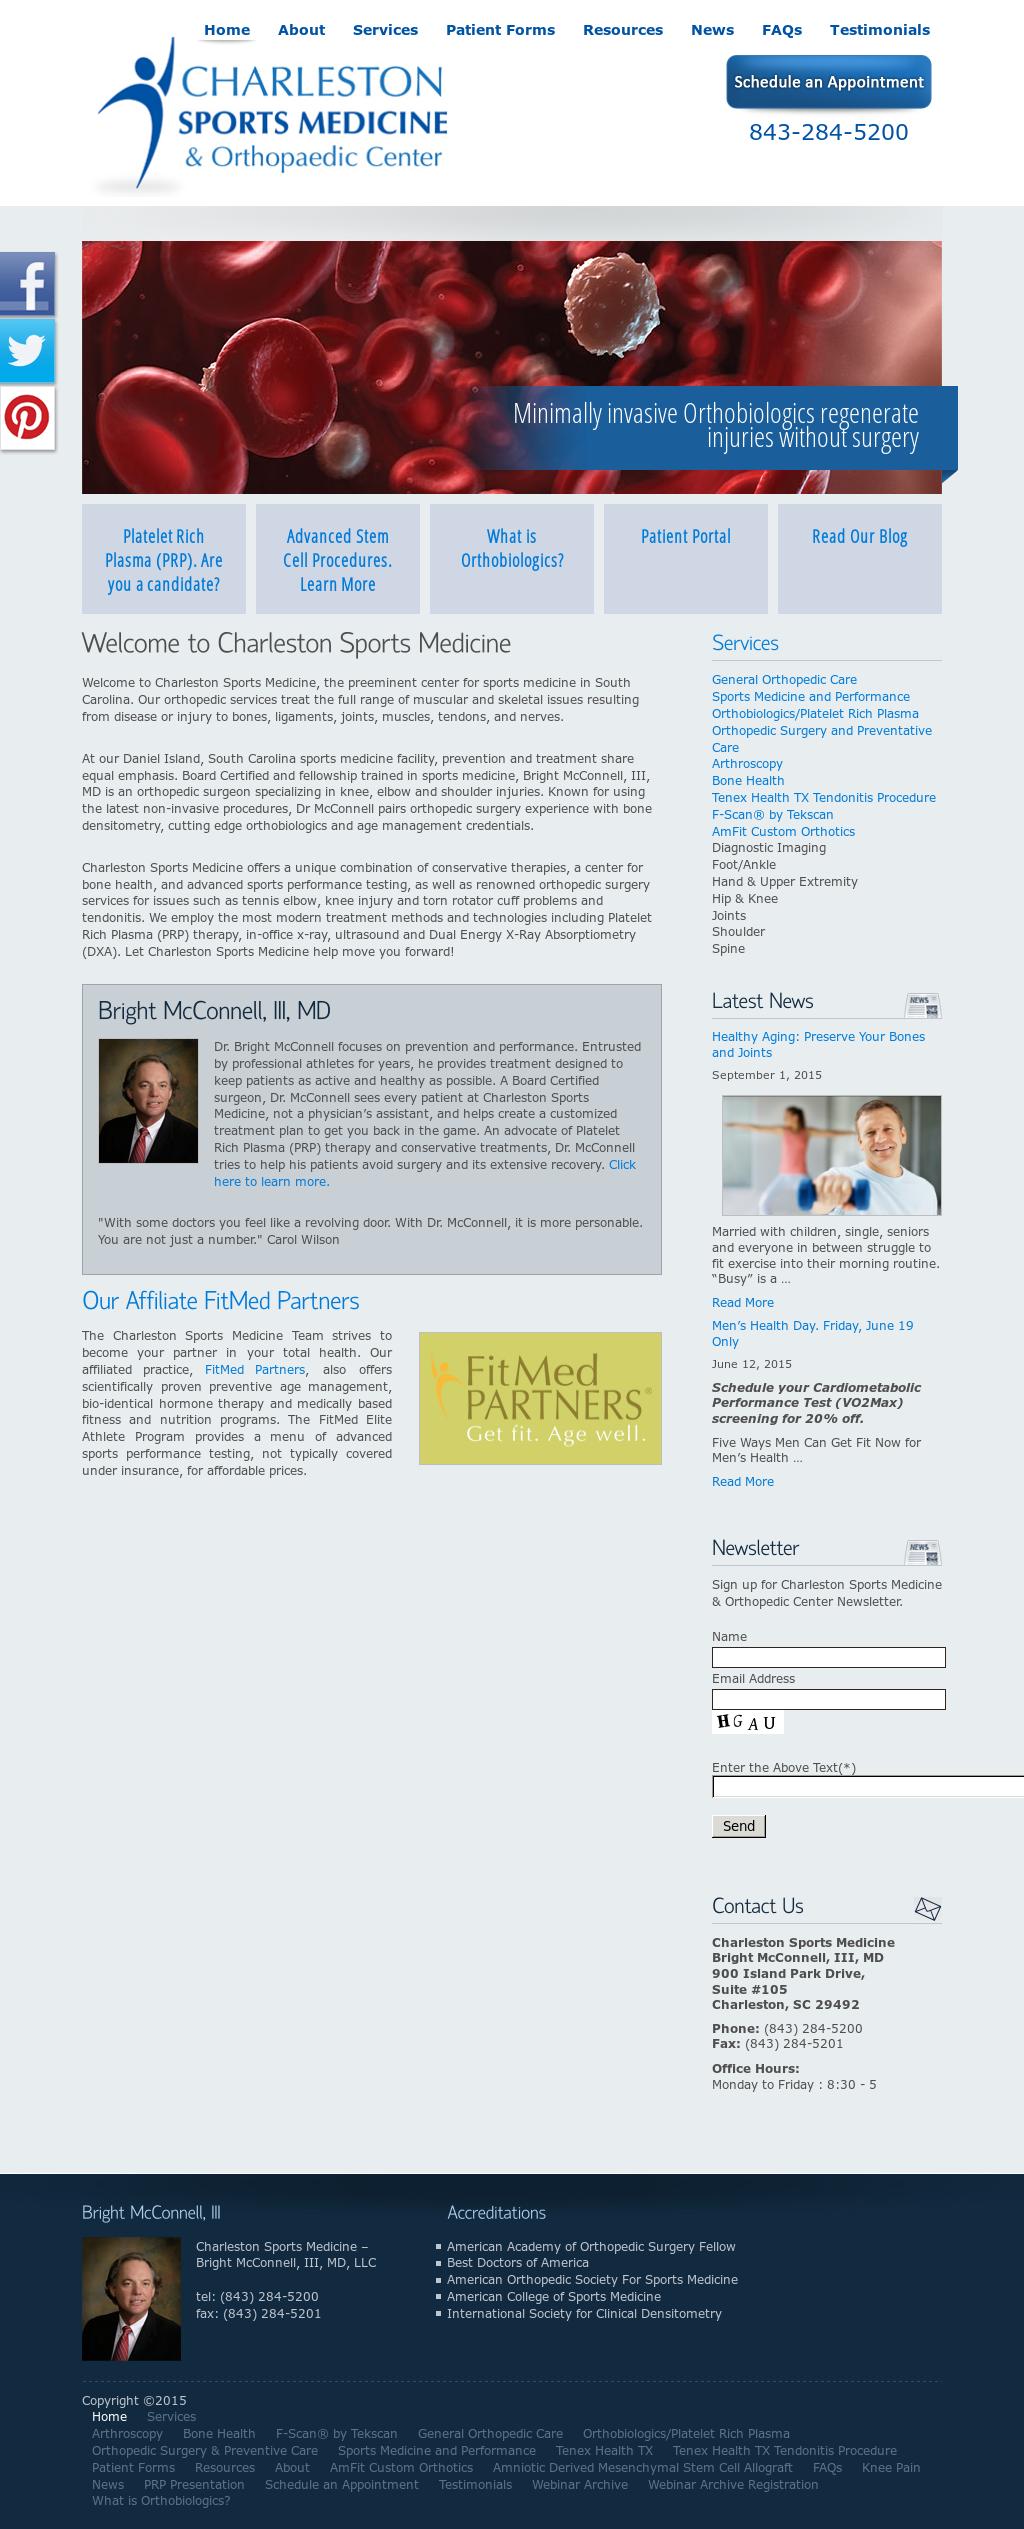 Charleston Sports Medicine Competitors, Revenue and Employees